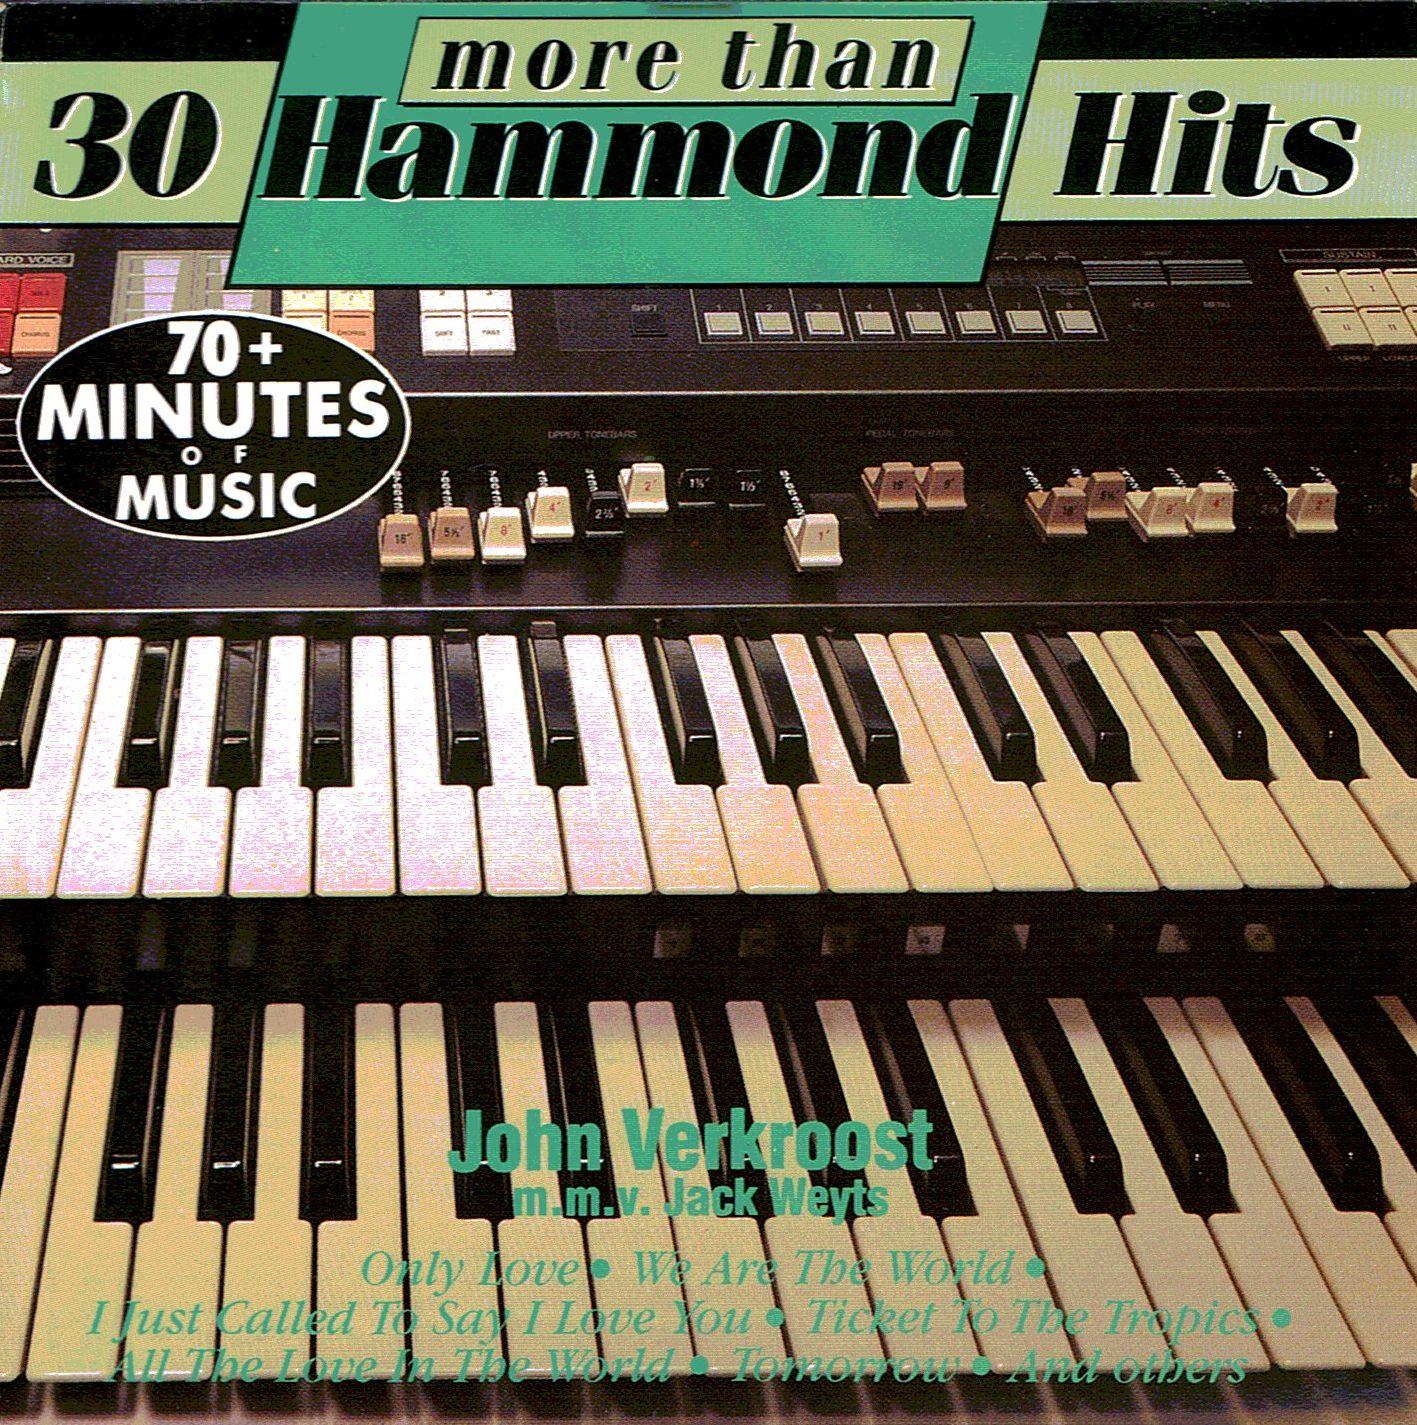 John Verkroost - More than 30 Hammond Hits